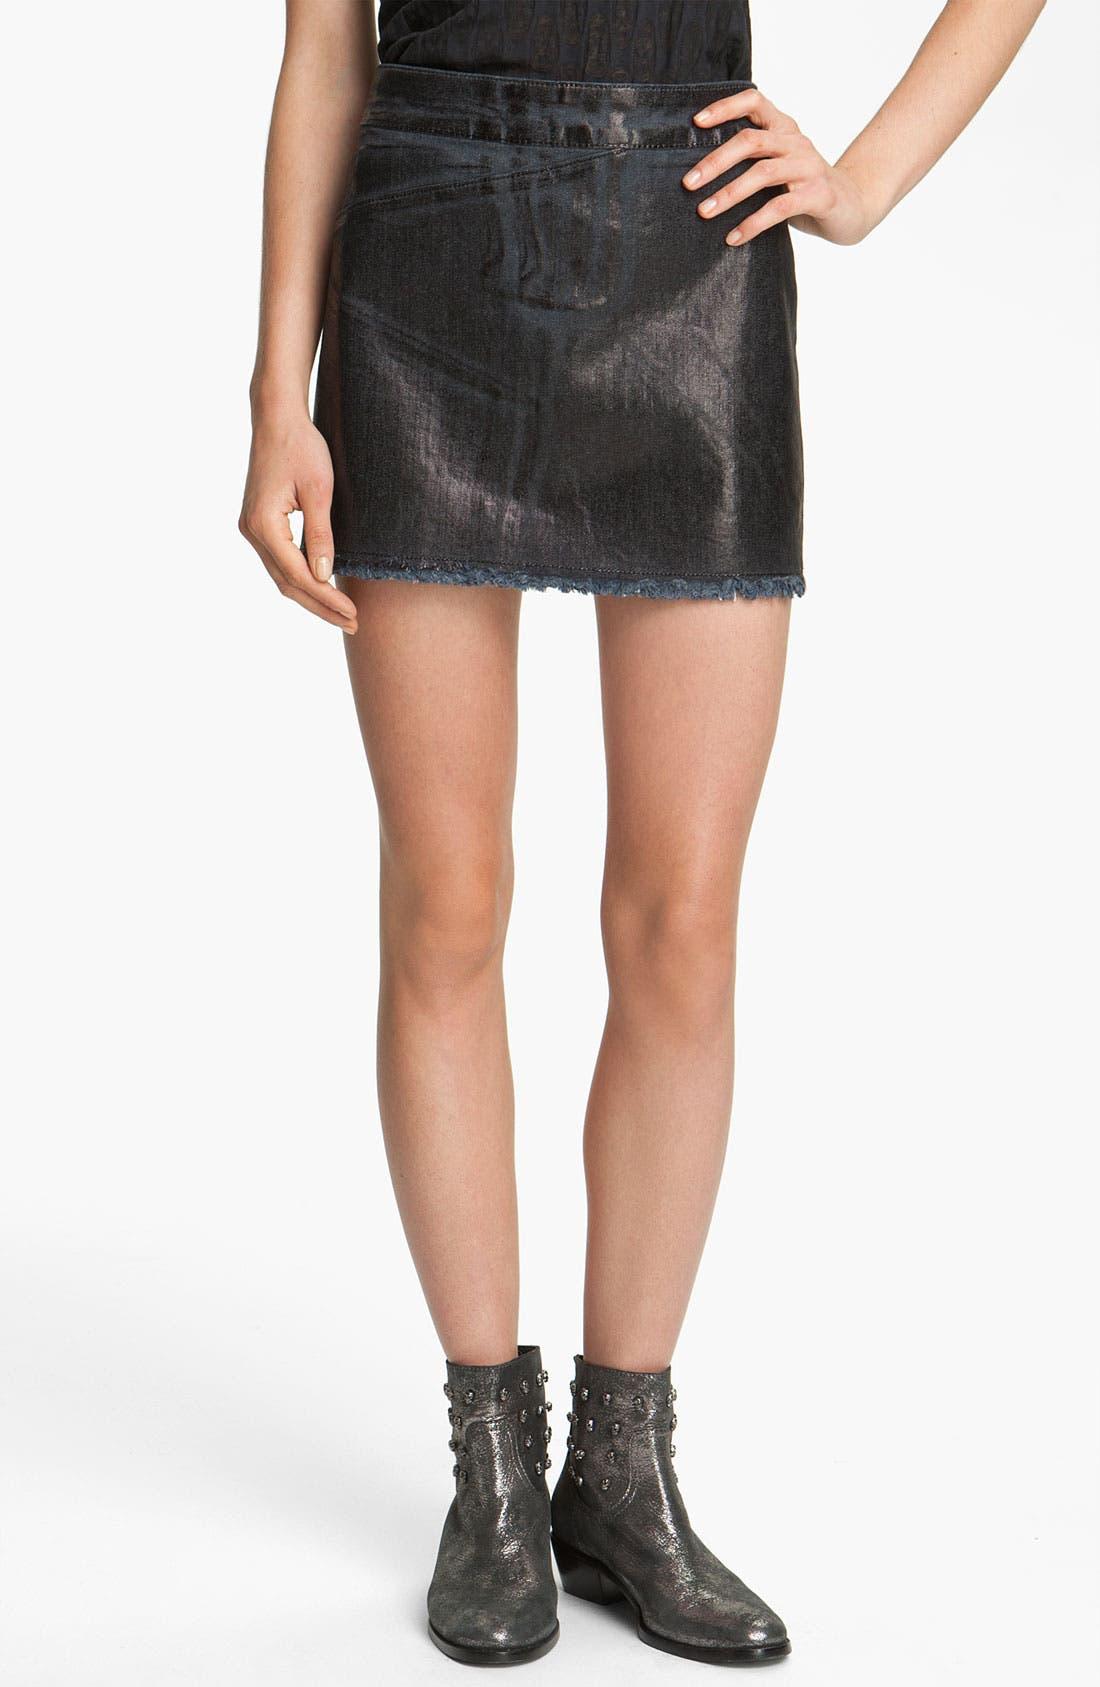 Alternate Image 1 Selected - Zadig & Voltaire Oil Washed Stretch Denim Miniskirt